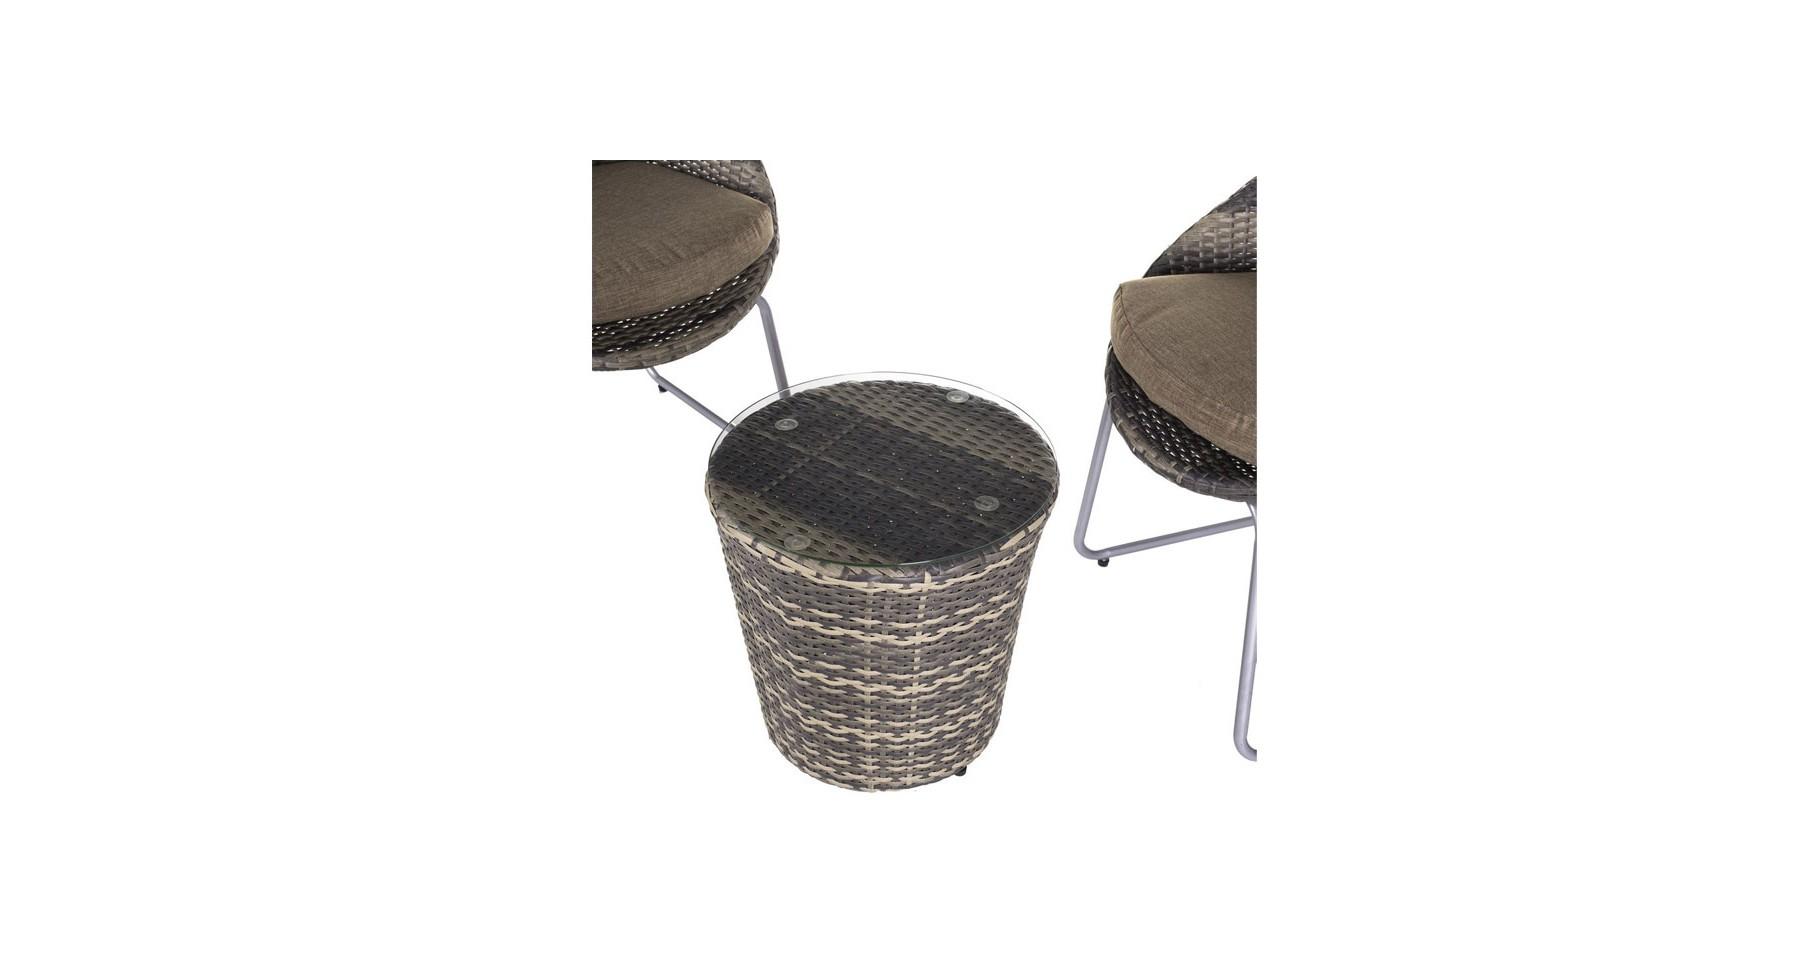 Salon De Jardin 2 Fauteuils + 1 Table D'appoint En Rotin Bicolore Adeline avec Mobilier De Jardin Destockage